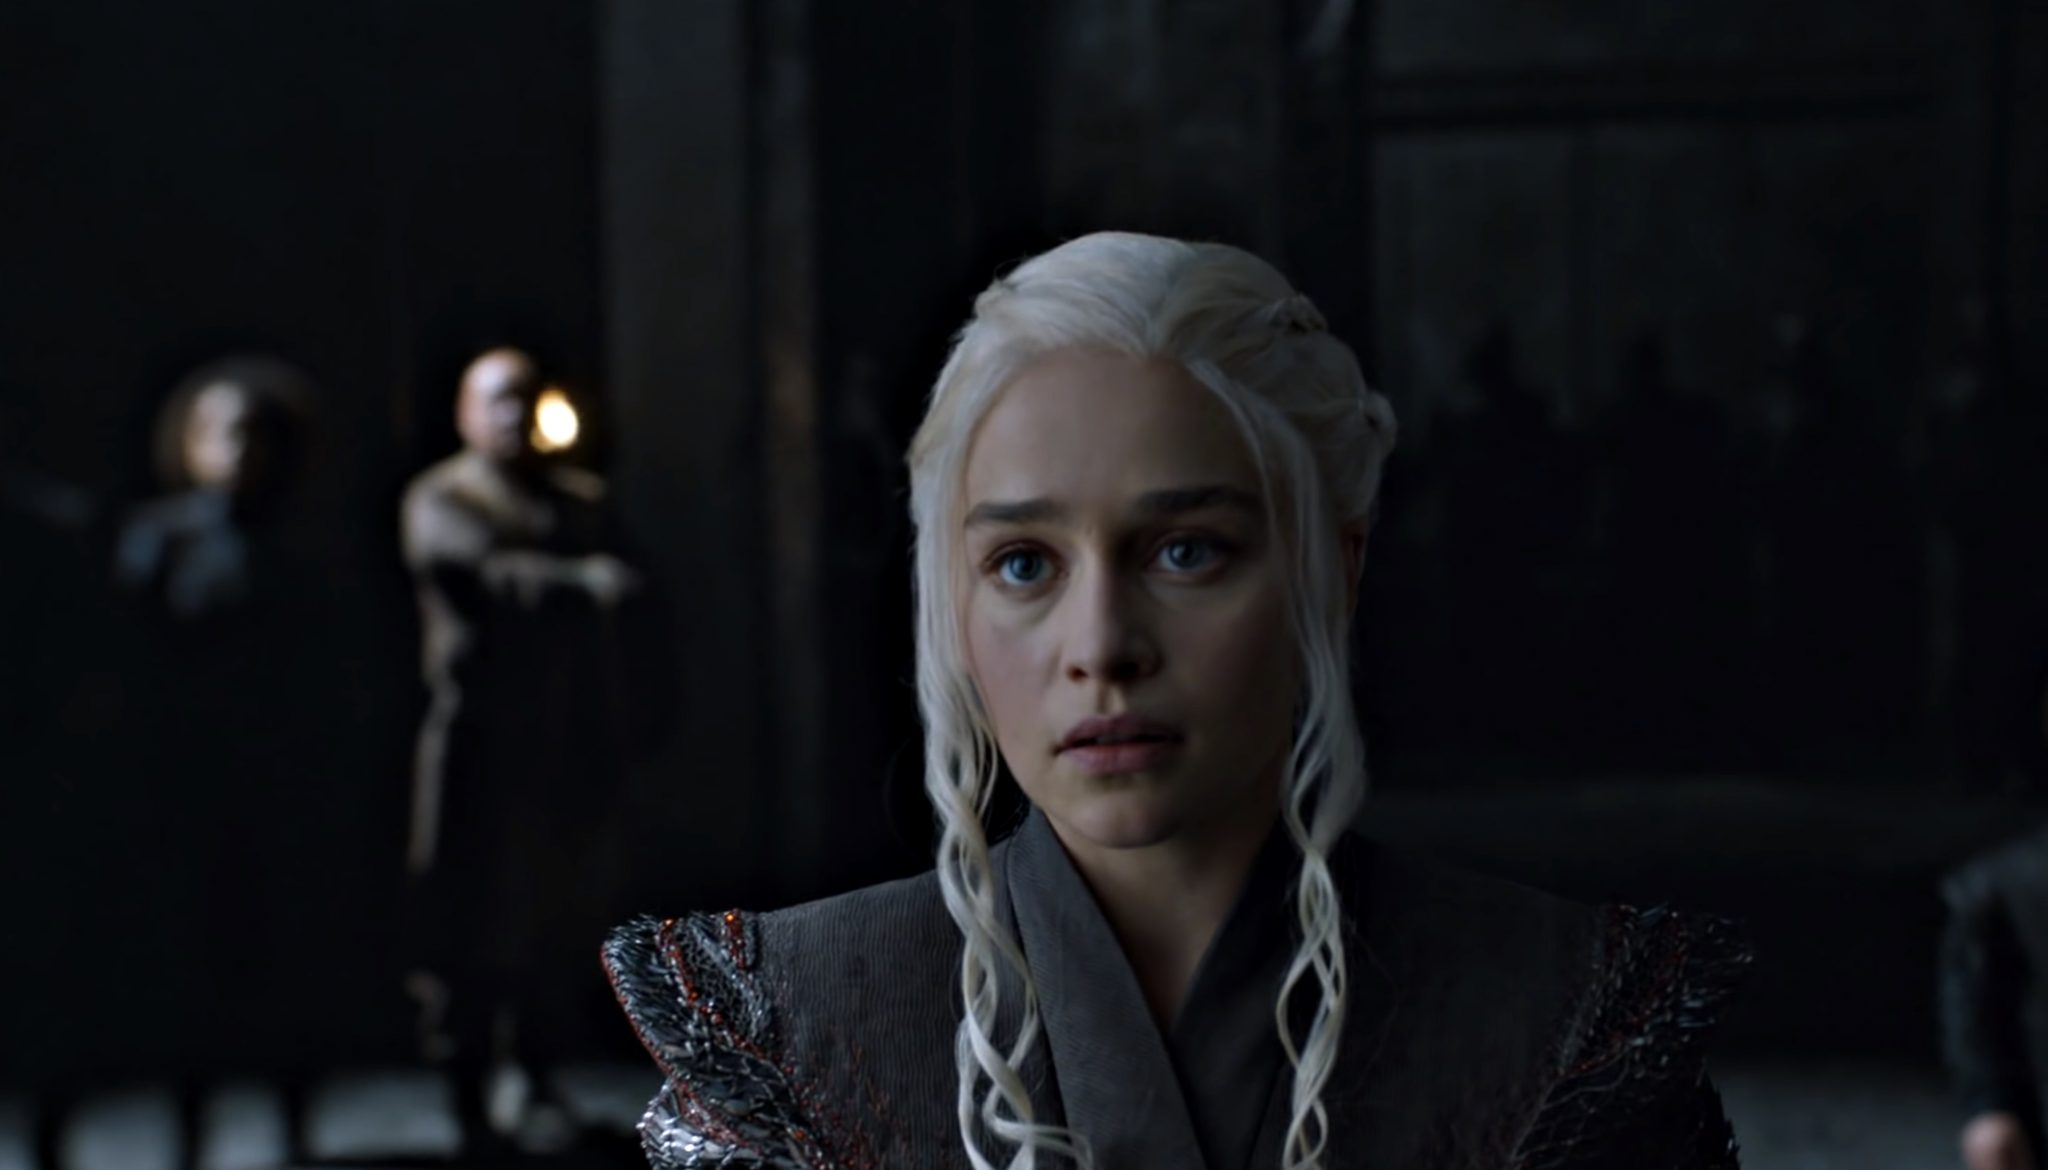 New Targaryen movie Emilia Clarke, Daenerys Targaryen, Targaryen Prequel-https-//www.youtube.com/watch?v=7I4LUKNwlyY